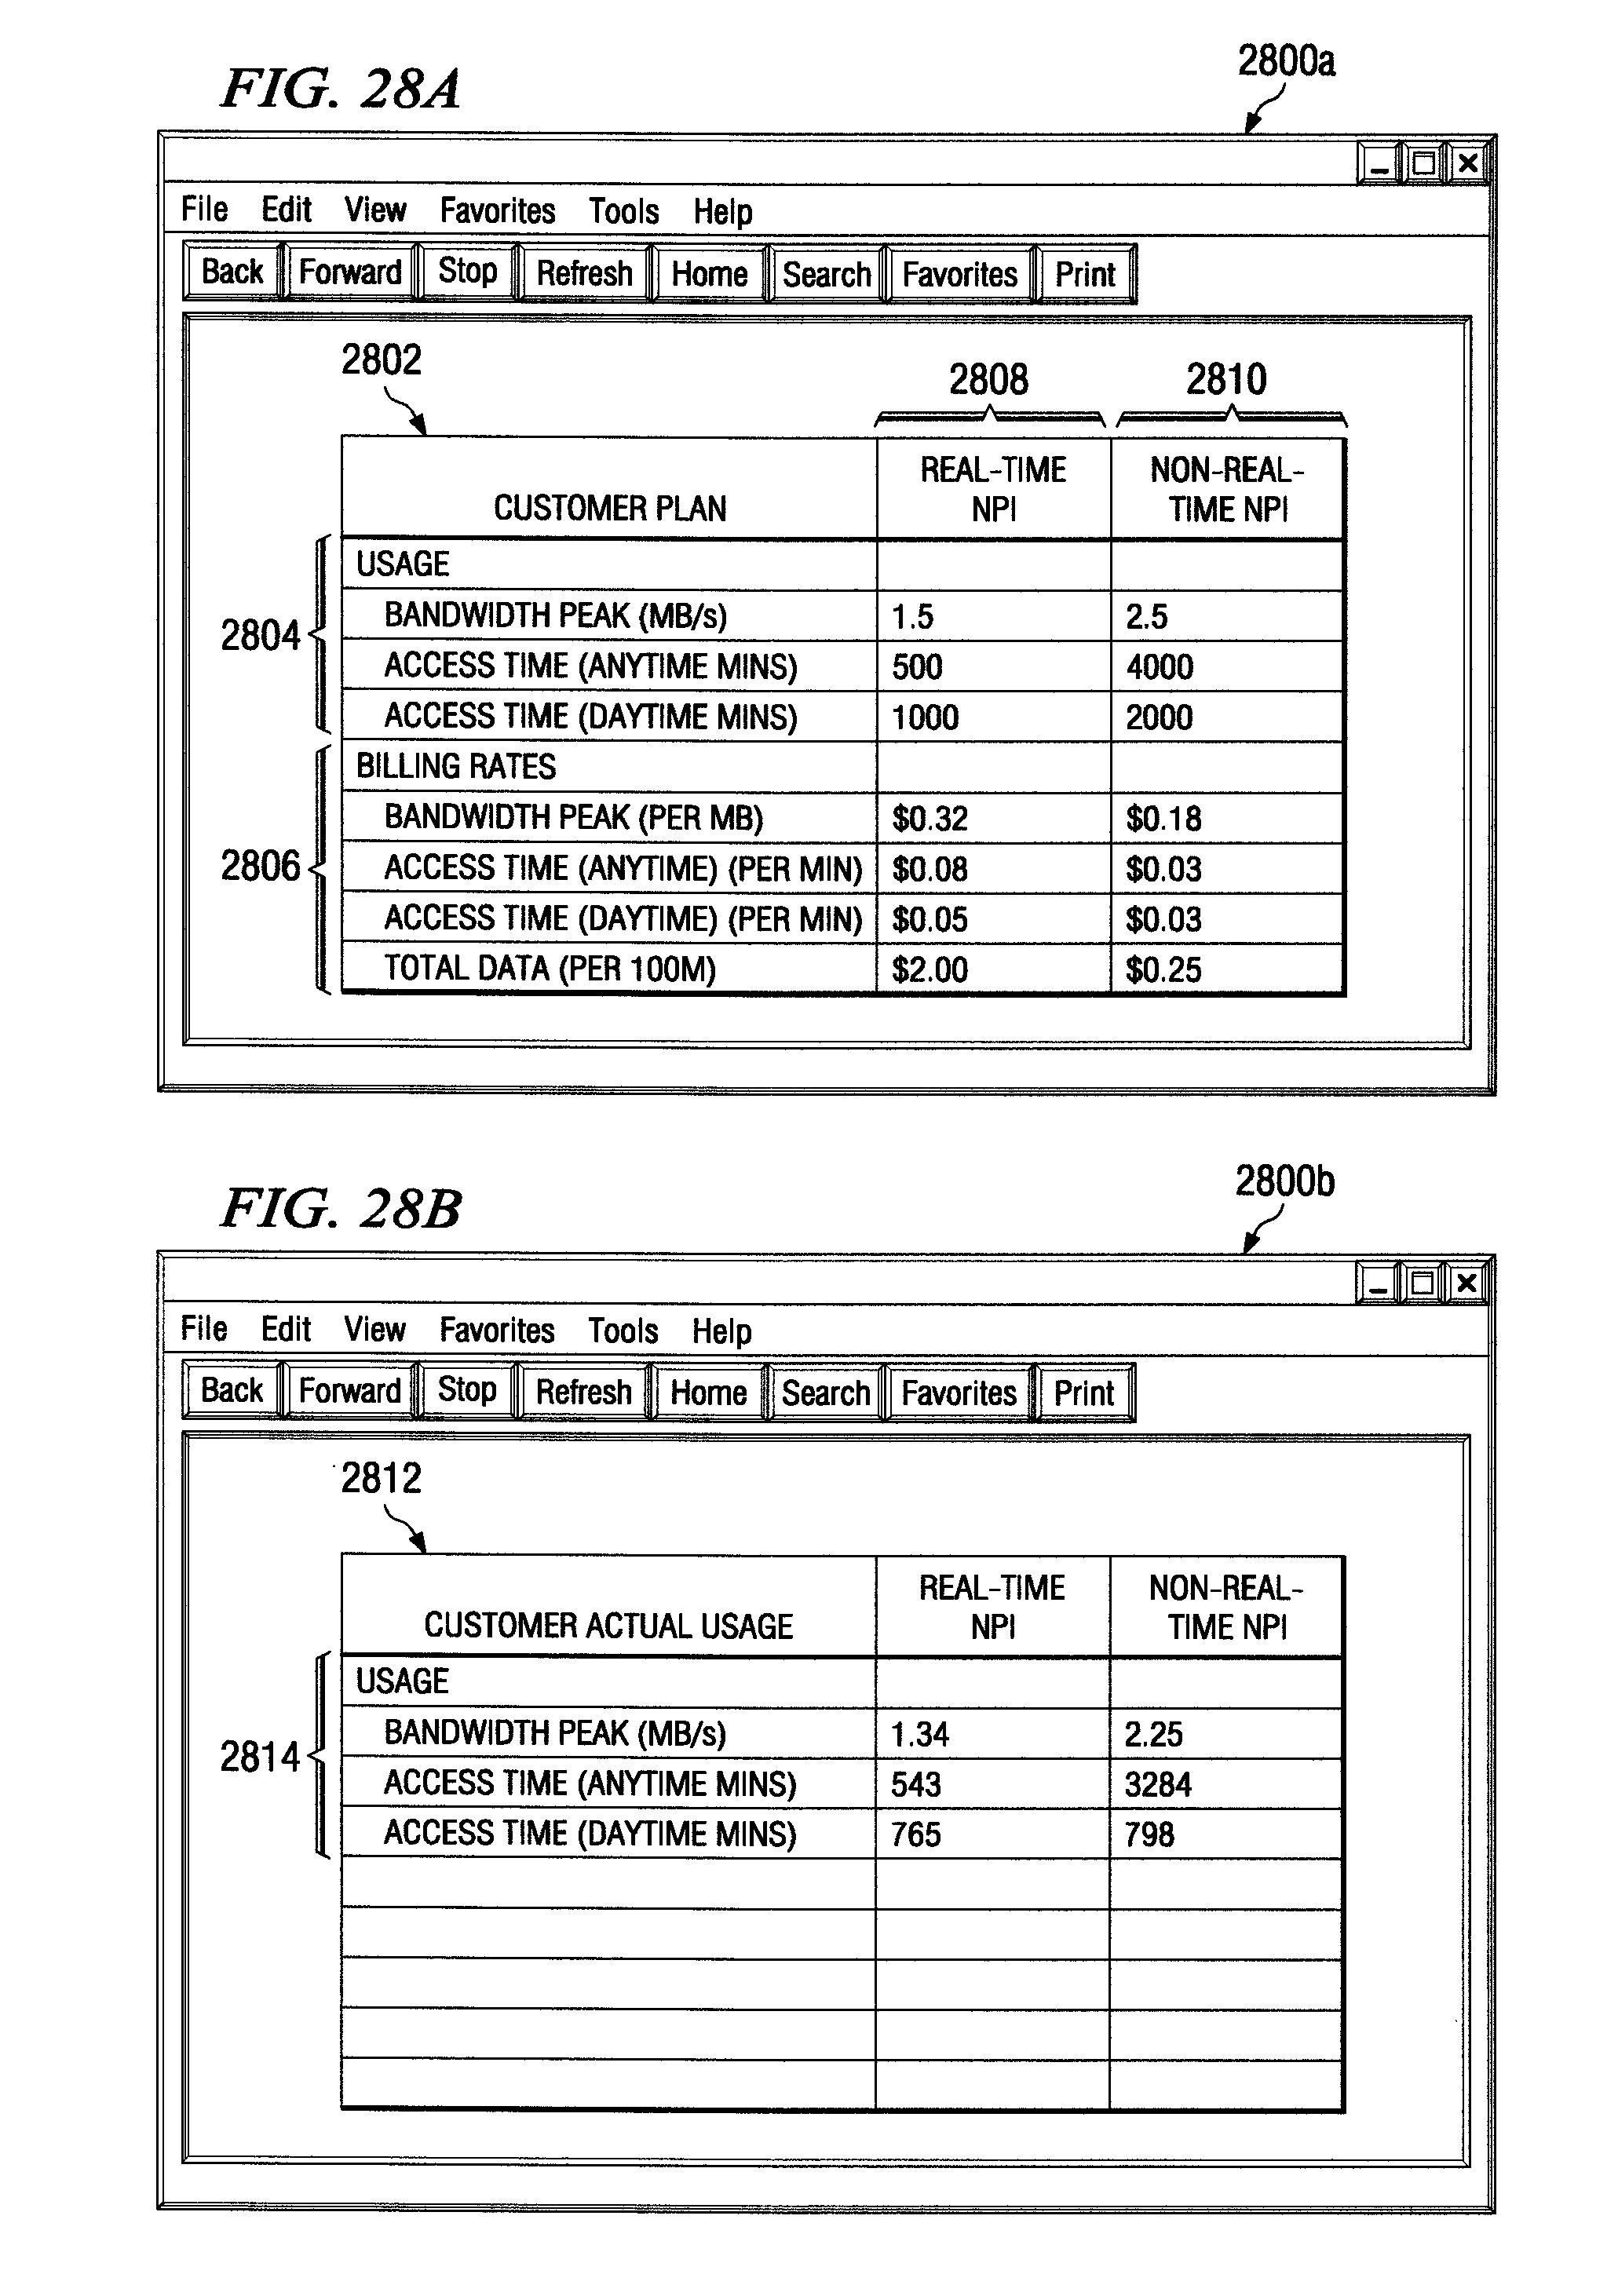 Patent US 8,213,366 B2